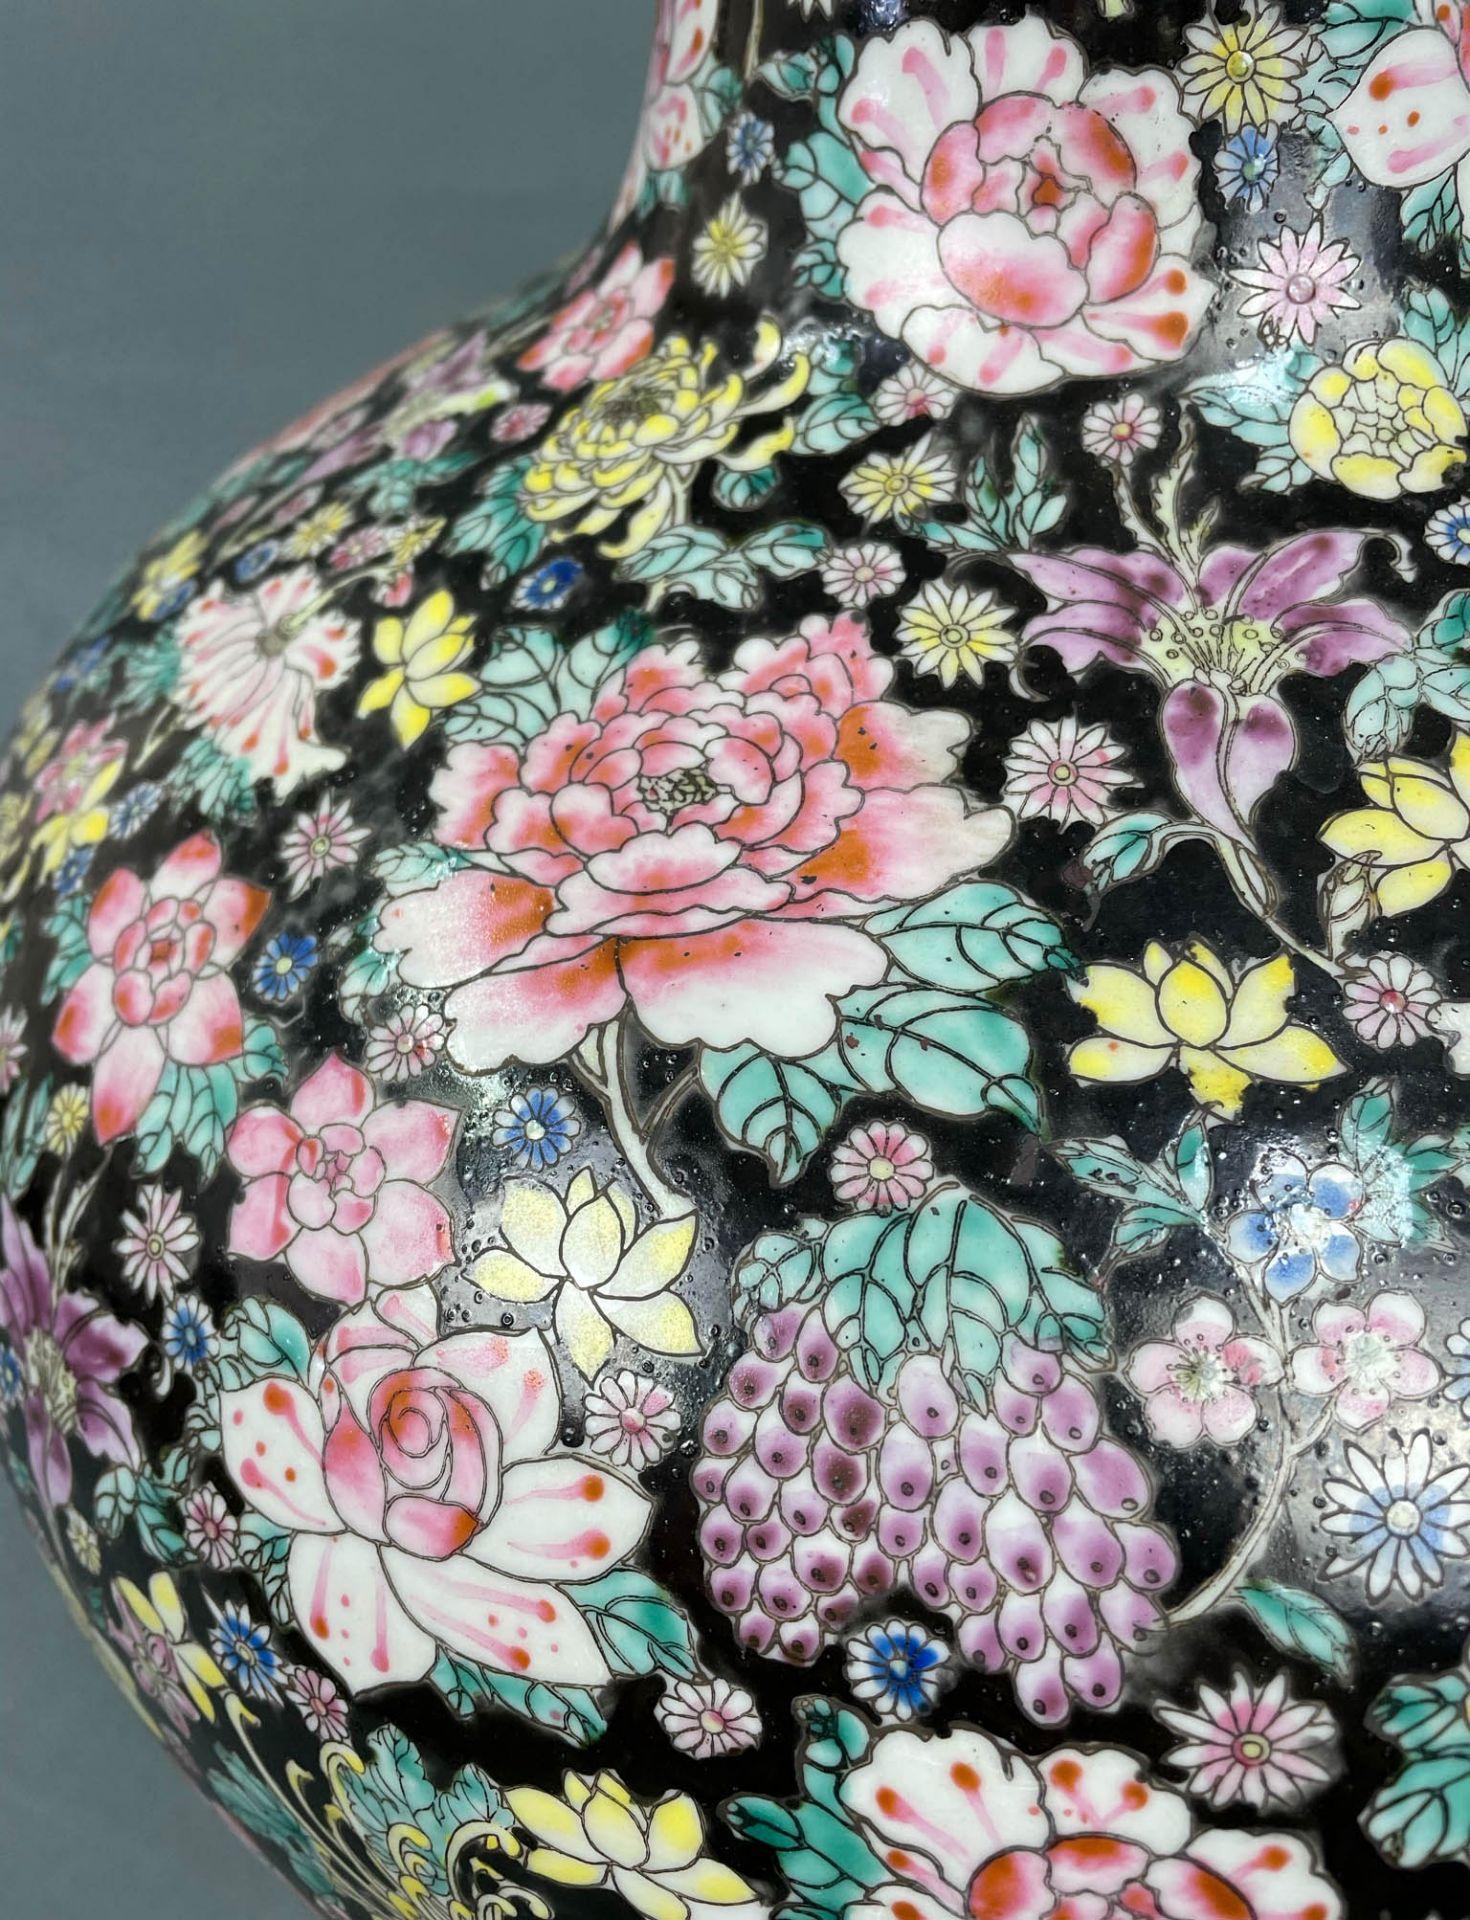 China. Porzellan. Vase. Stempelmarke circa 1930 - 1950. 53 cm hoch. - Image 9 of 20